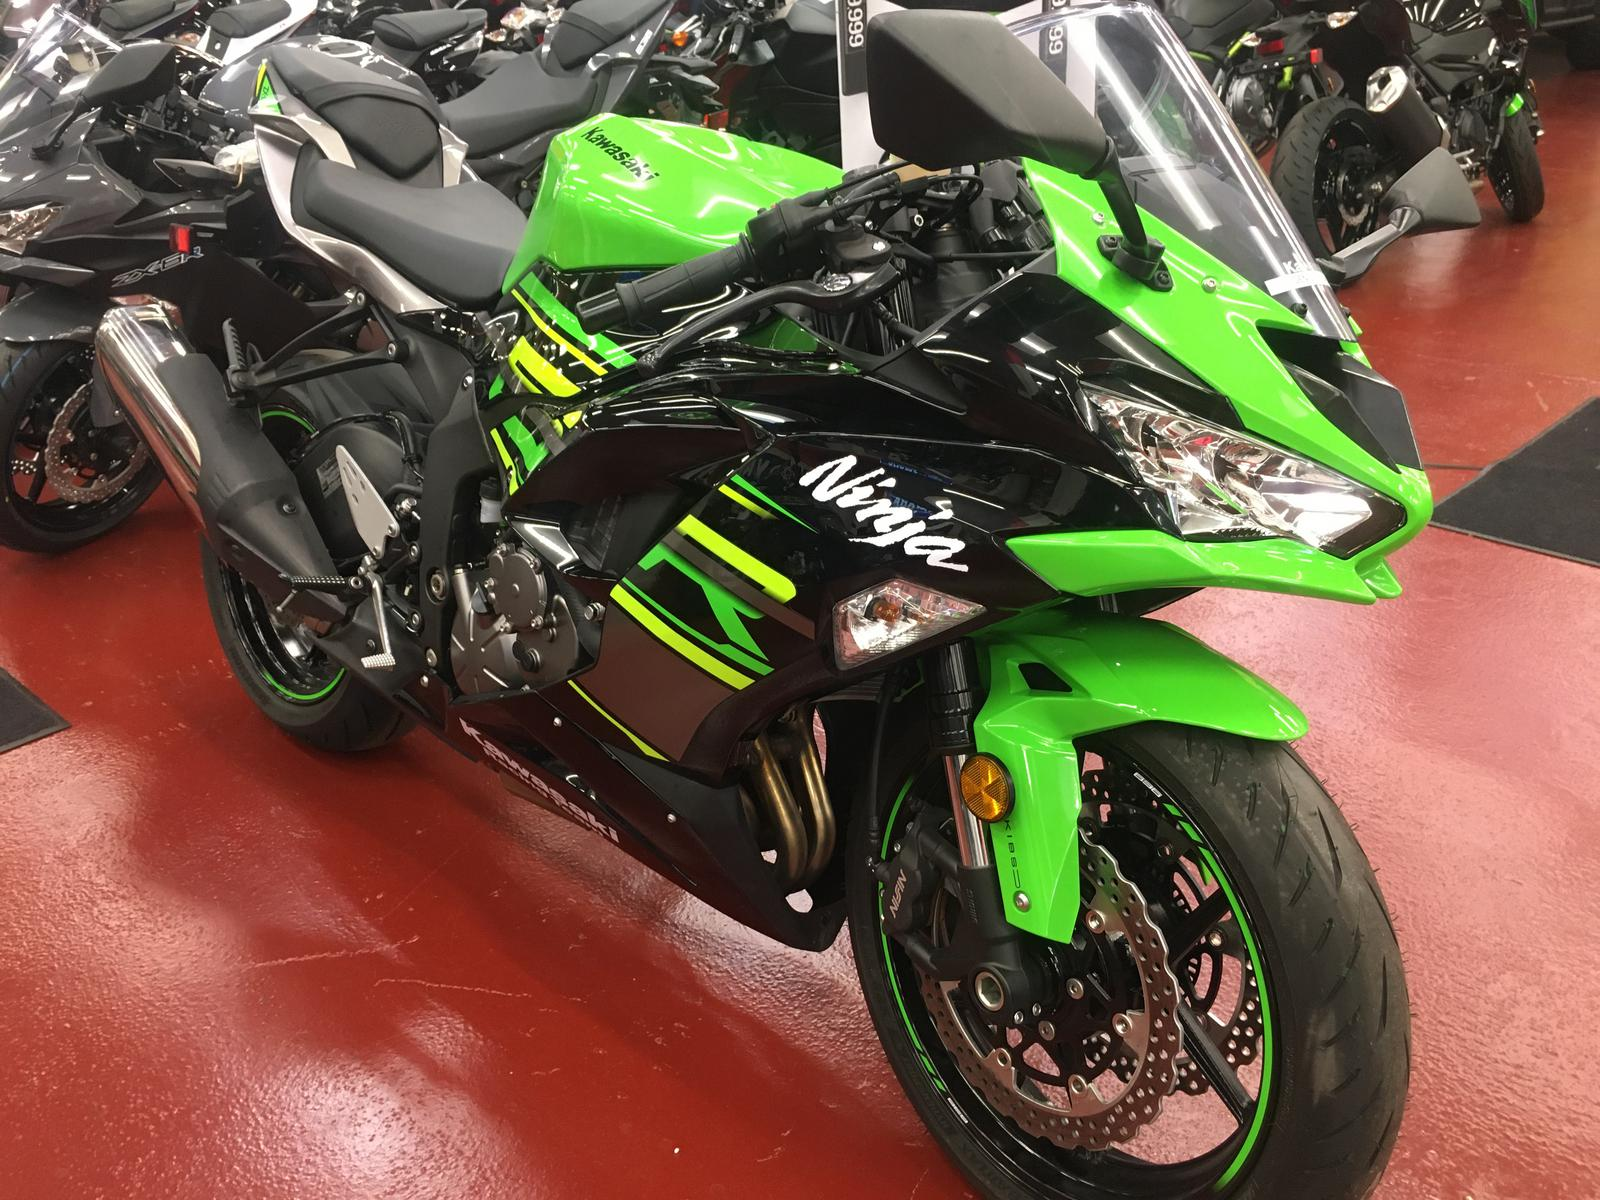 2019 Kawasaki Ninja Zx6r Abs For Sale In Indianapolis In